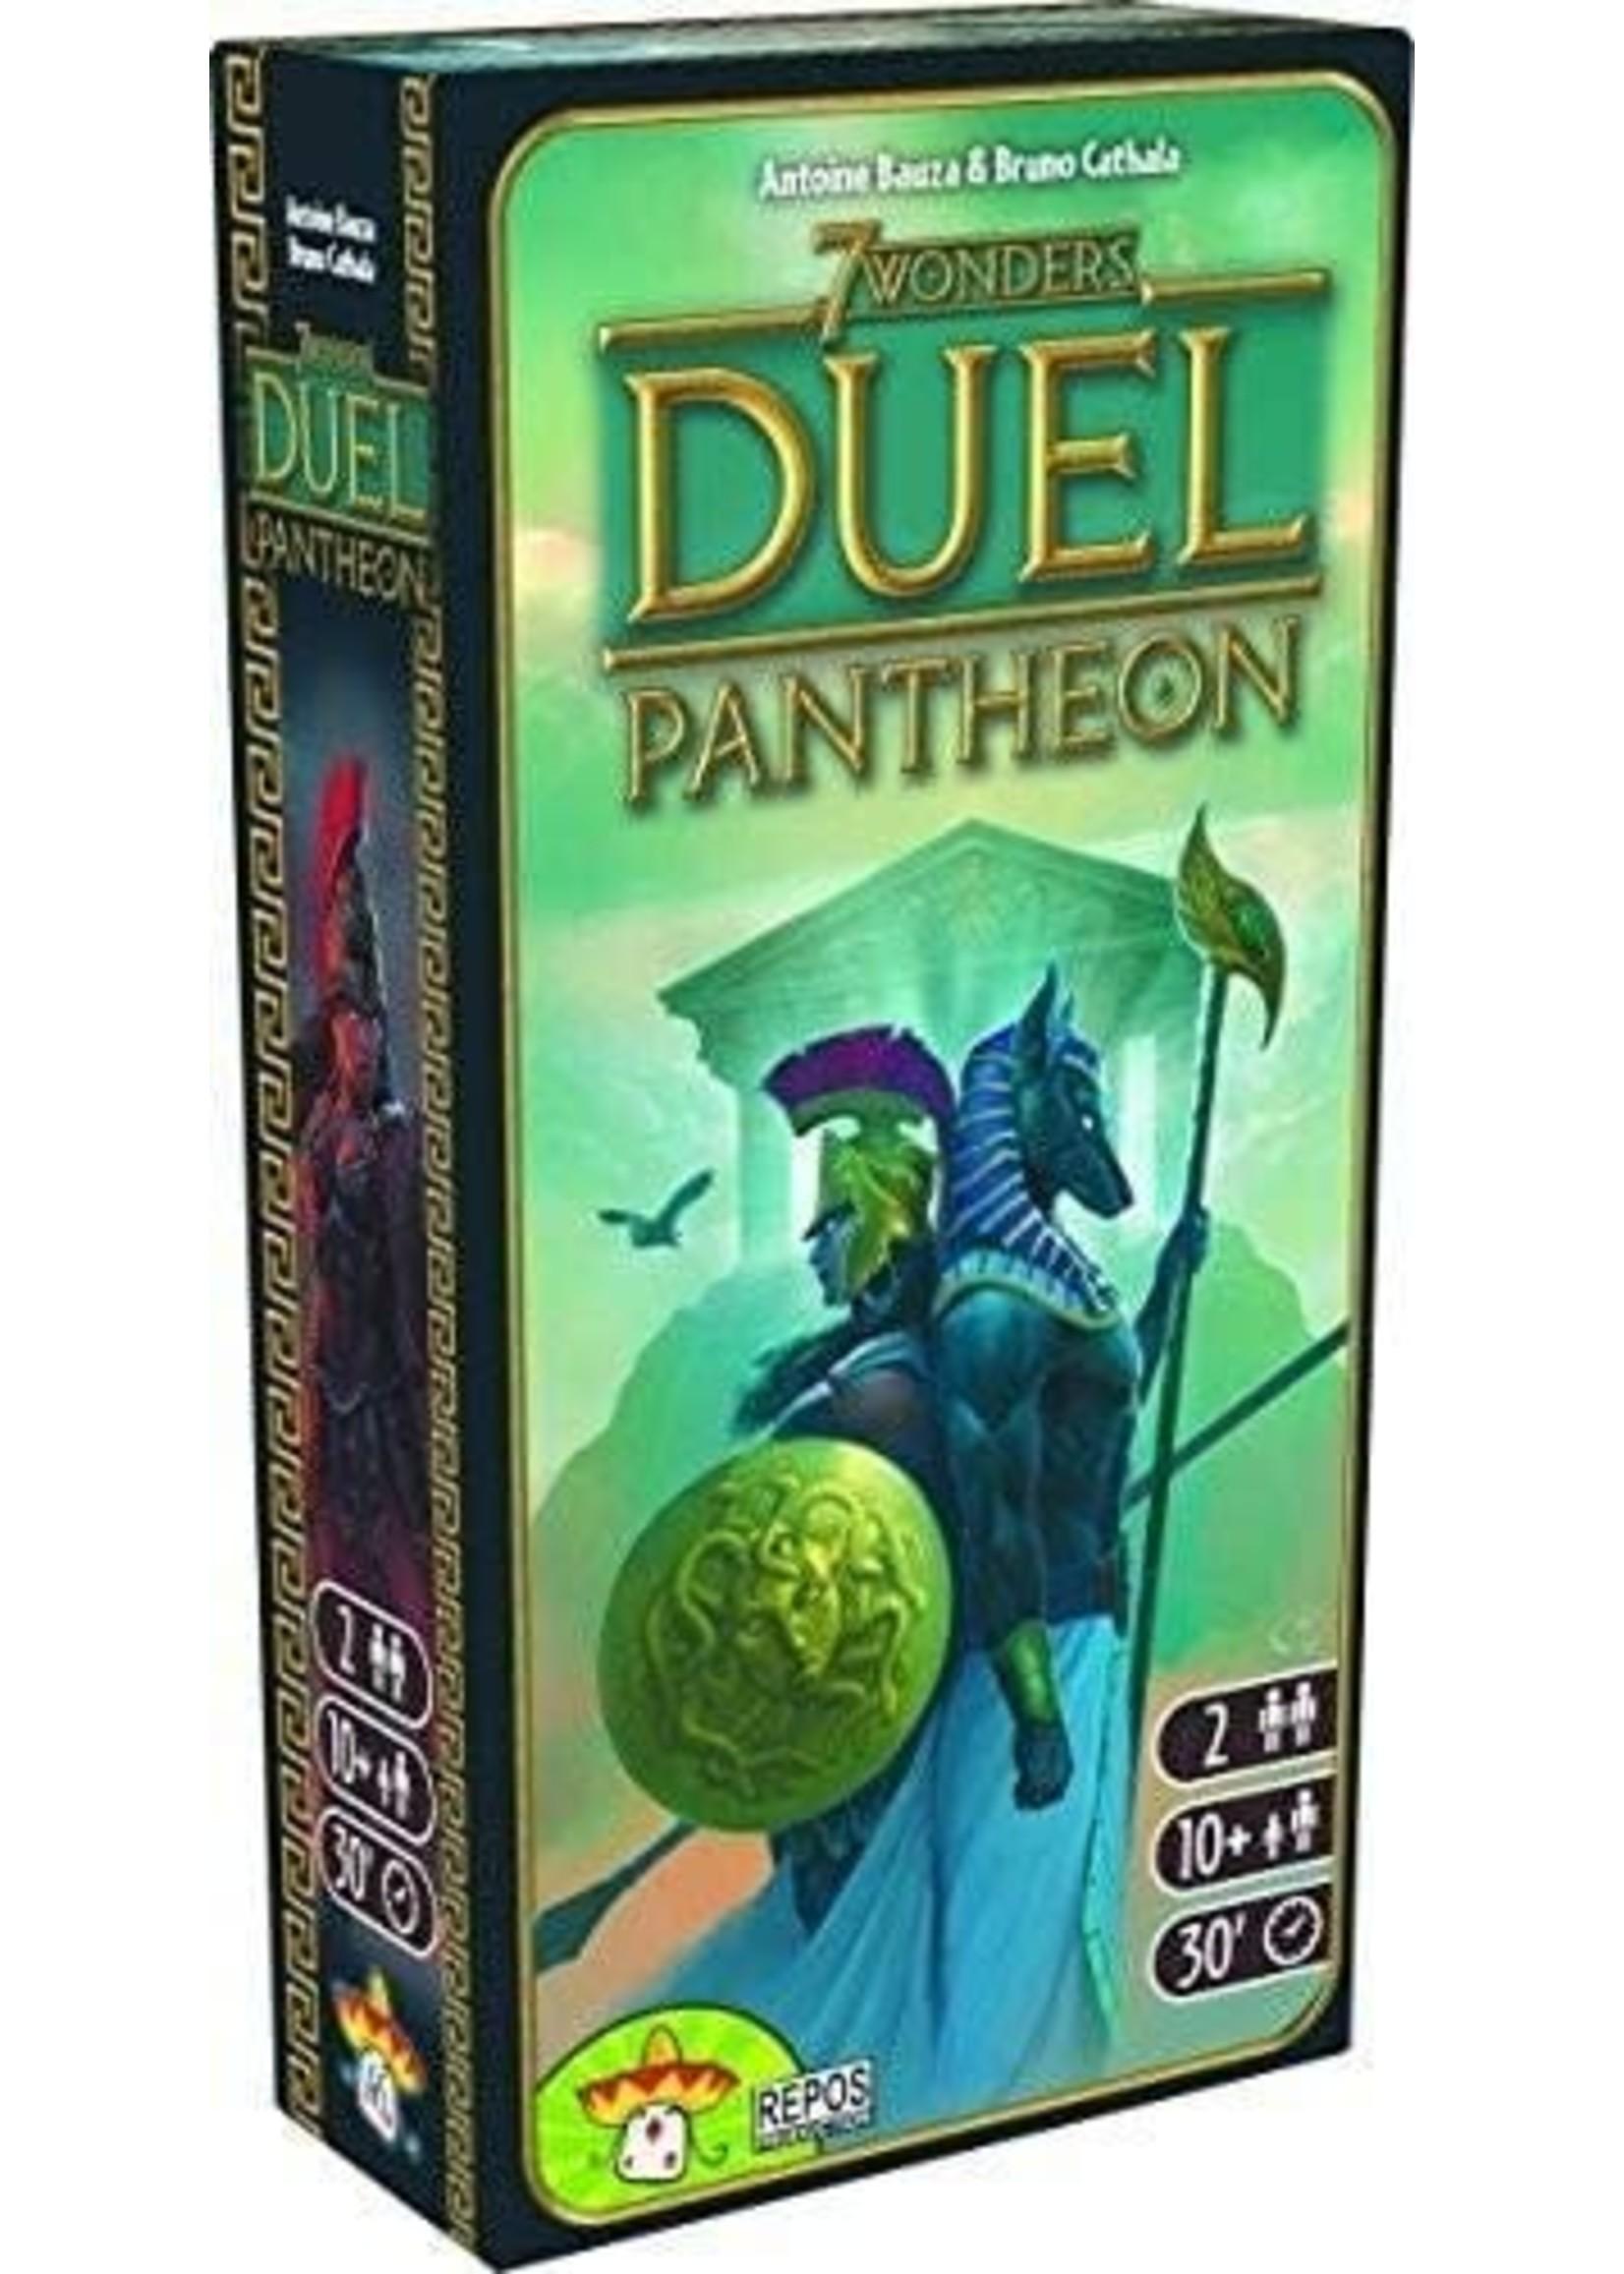 Repos Production 7 Wonders Duel: Pantheon Expansion